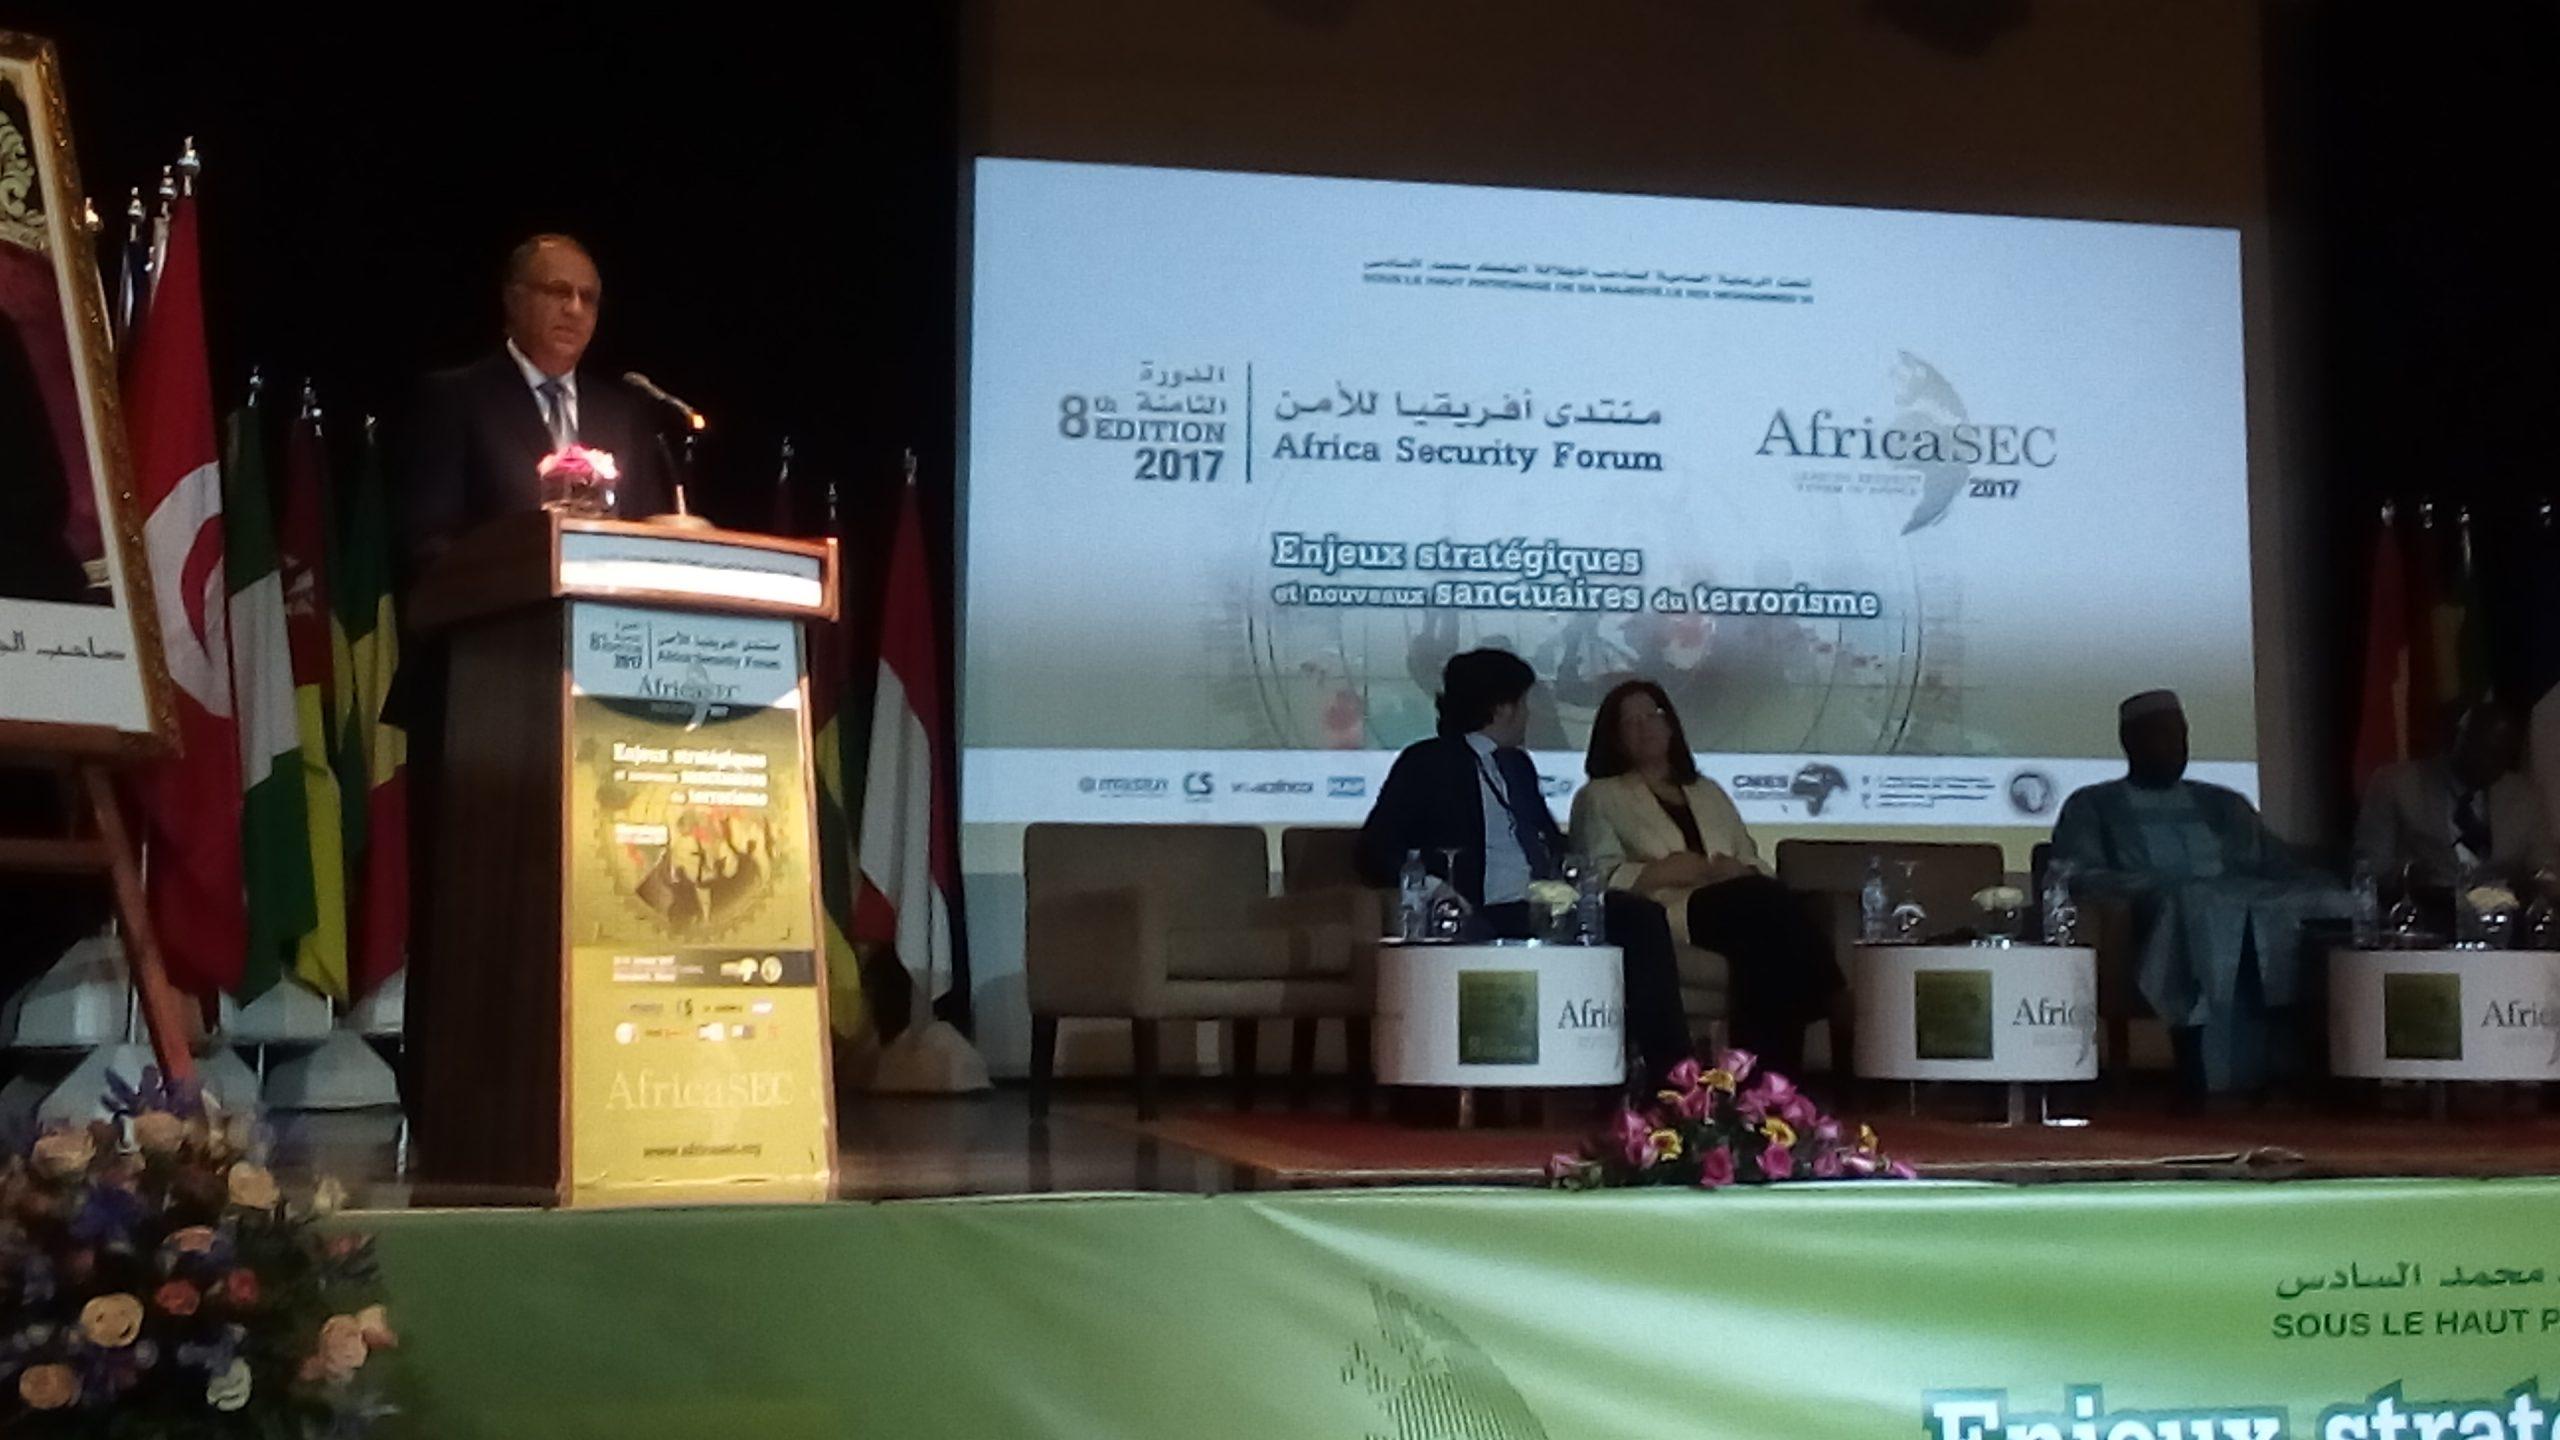 Photo of منتدى إفريقيا للأمن بمراكش.. تسليط الضوء على استراتيجية المديرية العامة للأمن الوطني في مجال محاربة الجريمة المعلوماتية